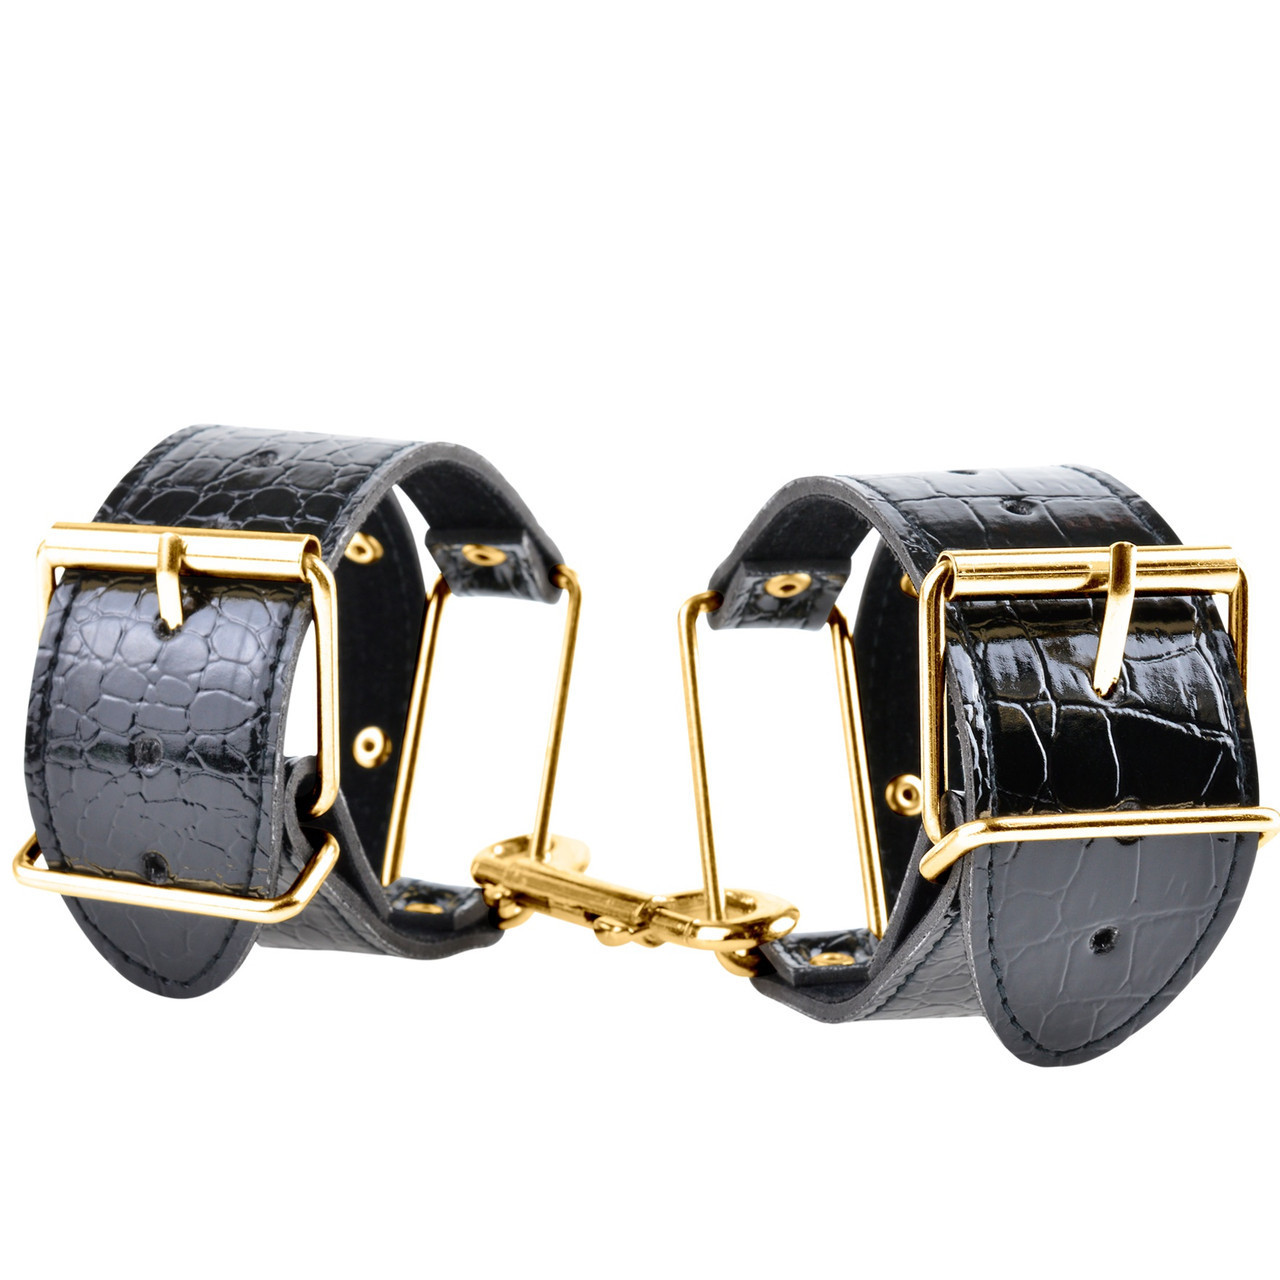 Наручники Fetish Fantasy Gold Cuffs от Pipedream Products